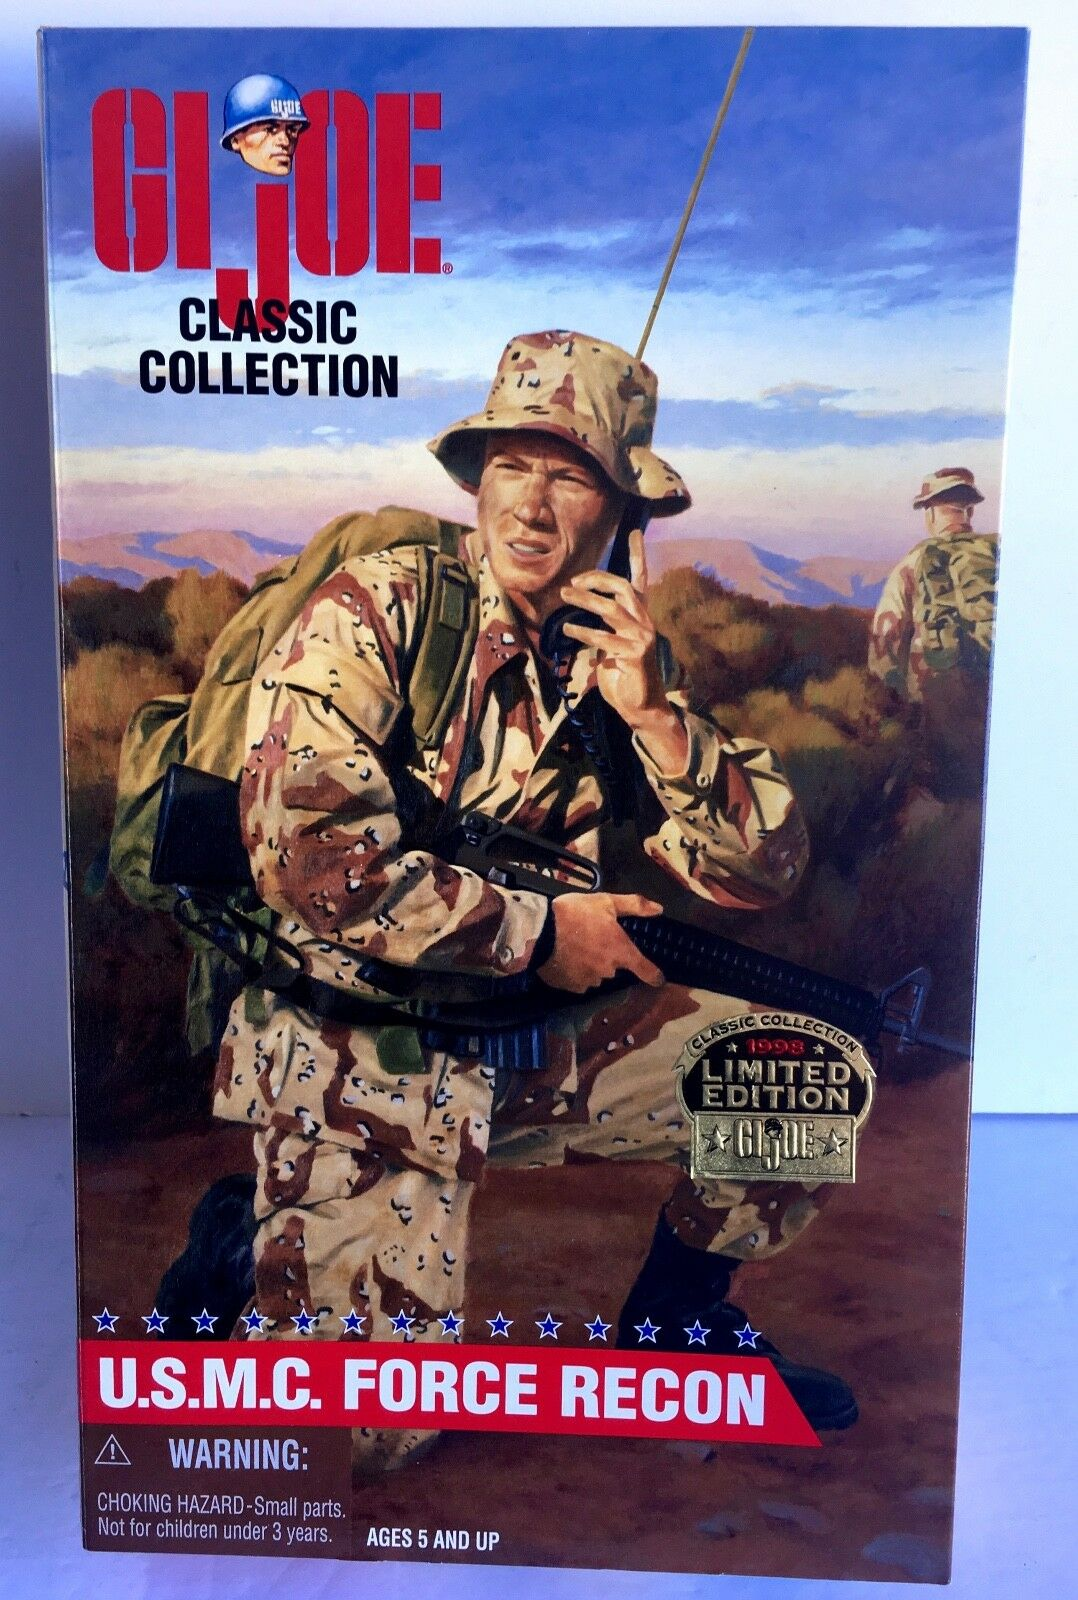 G.I.Joe U.S.M.C. FORCE RECON Limited Edition GJ-12